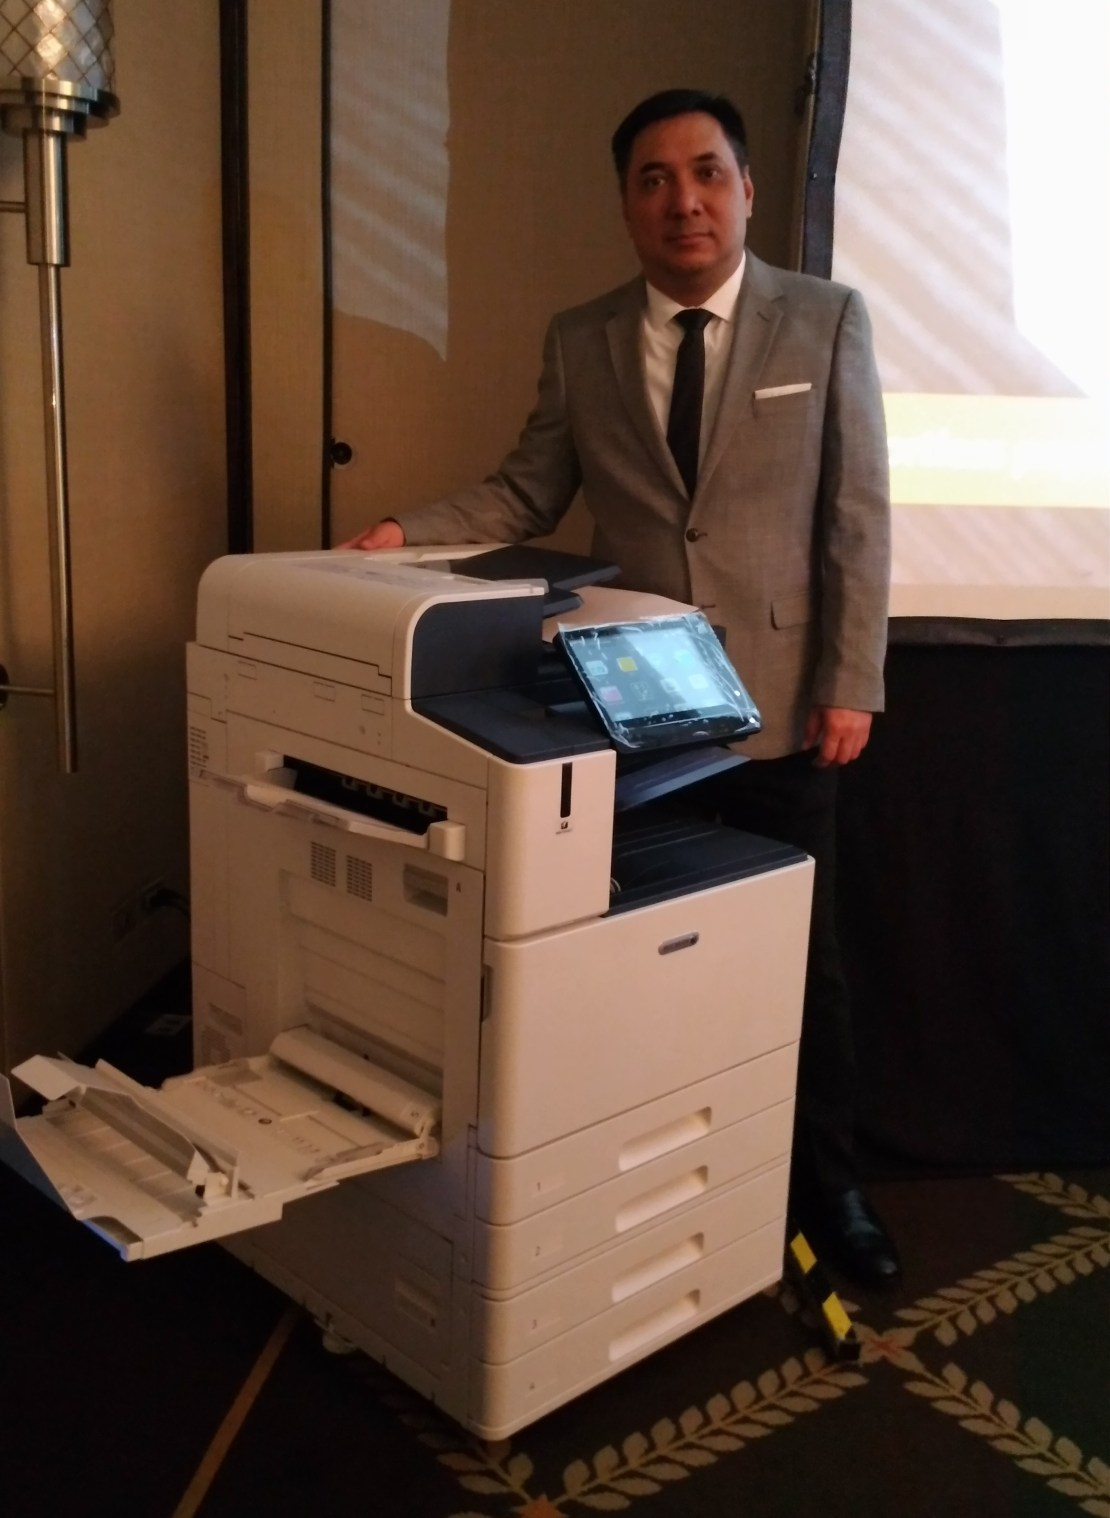 Oscar Dolendo head of Marketing Department Fuji Xerox - Science and Digital News